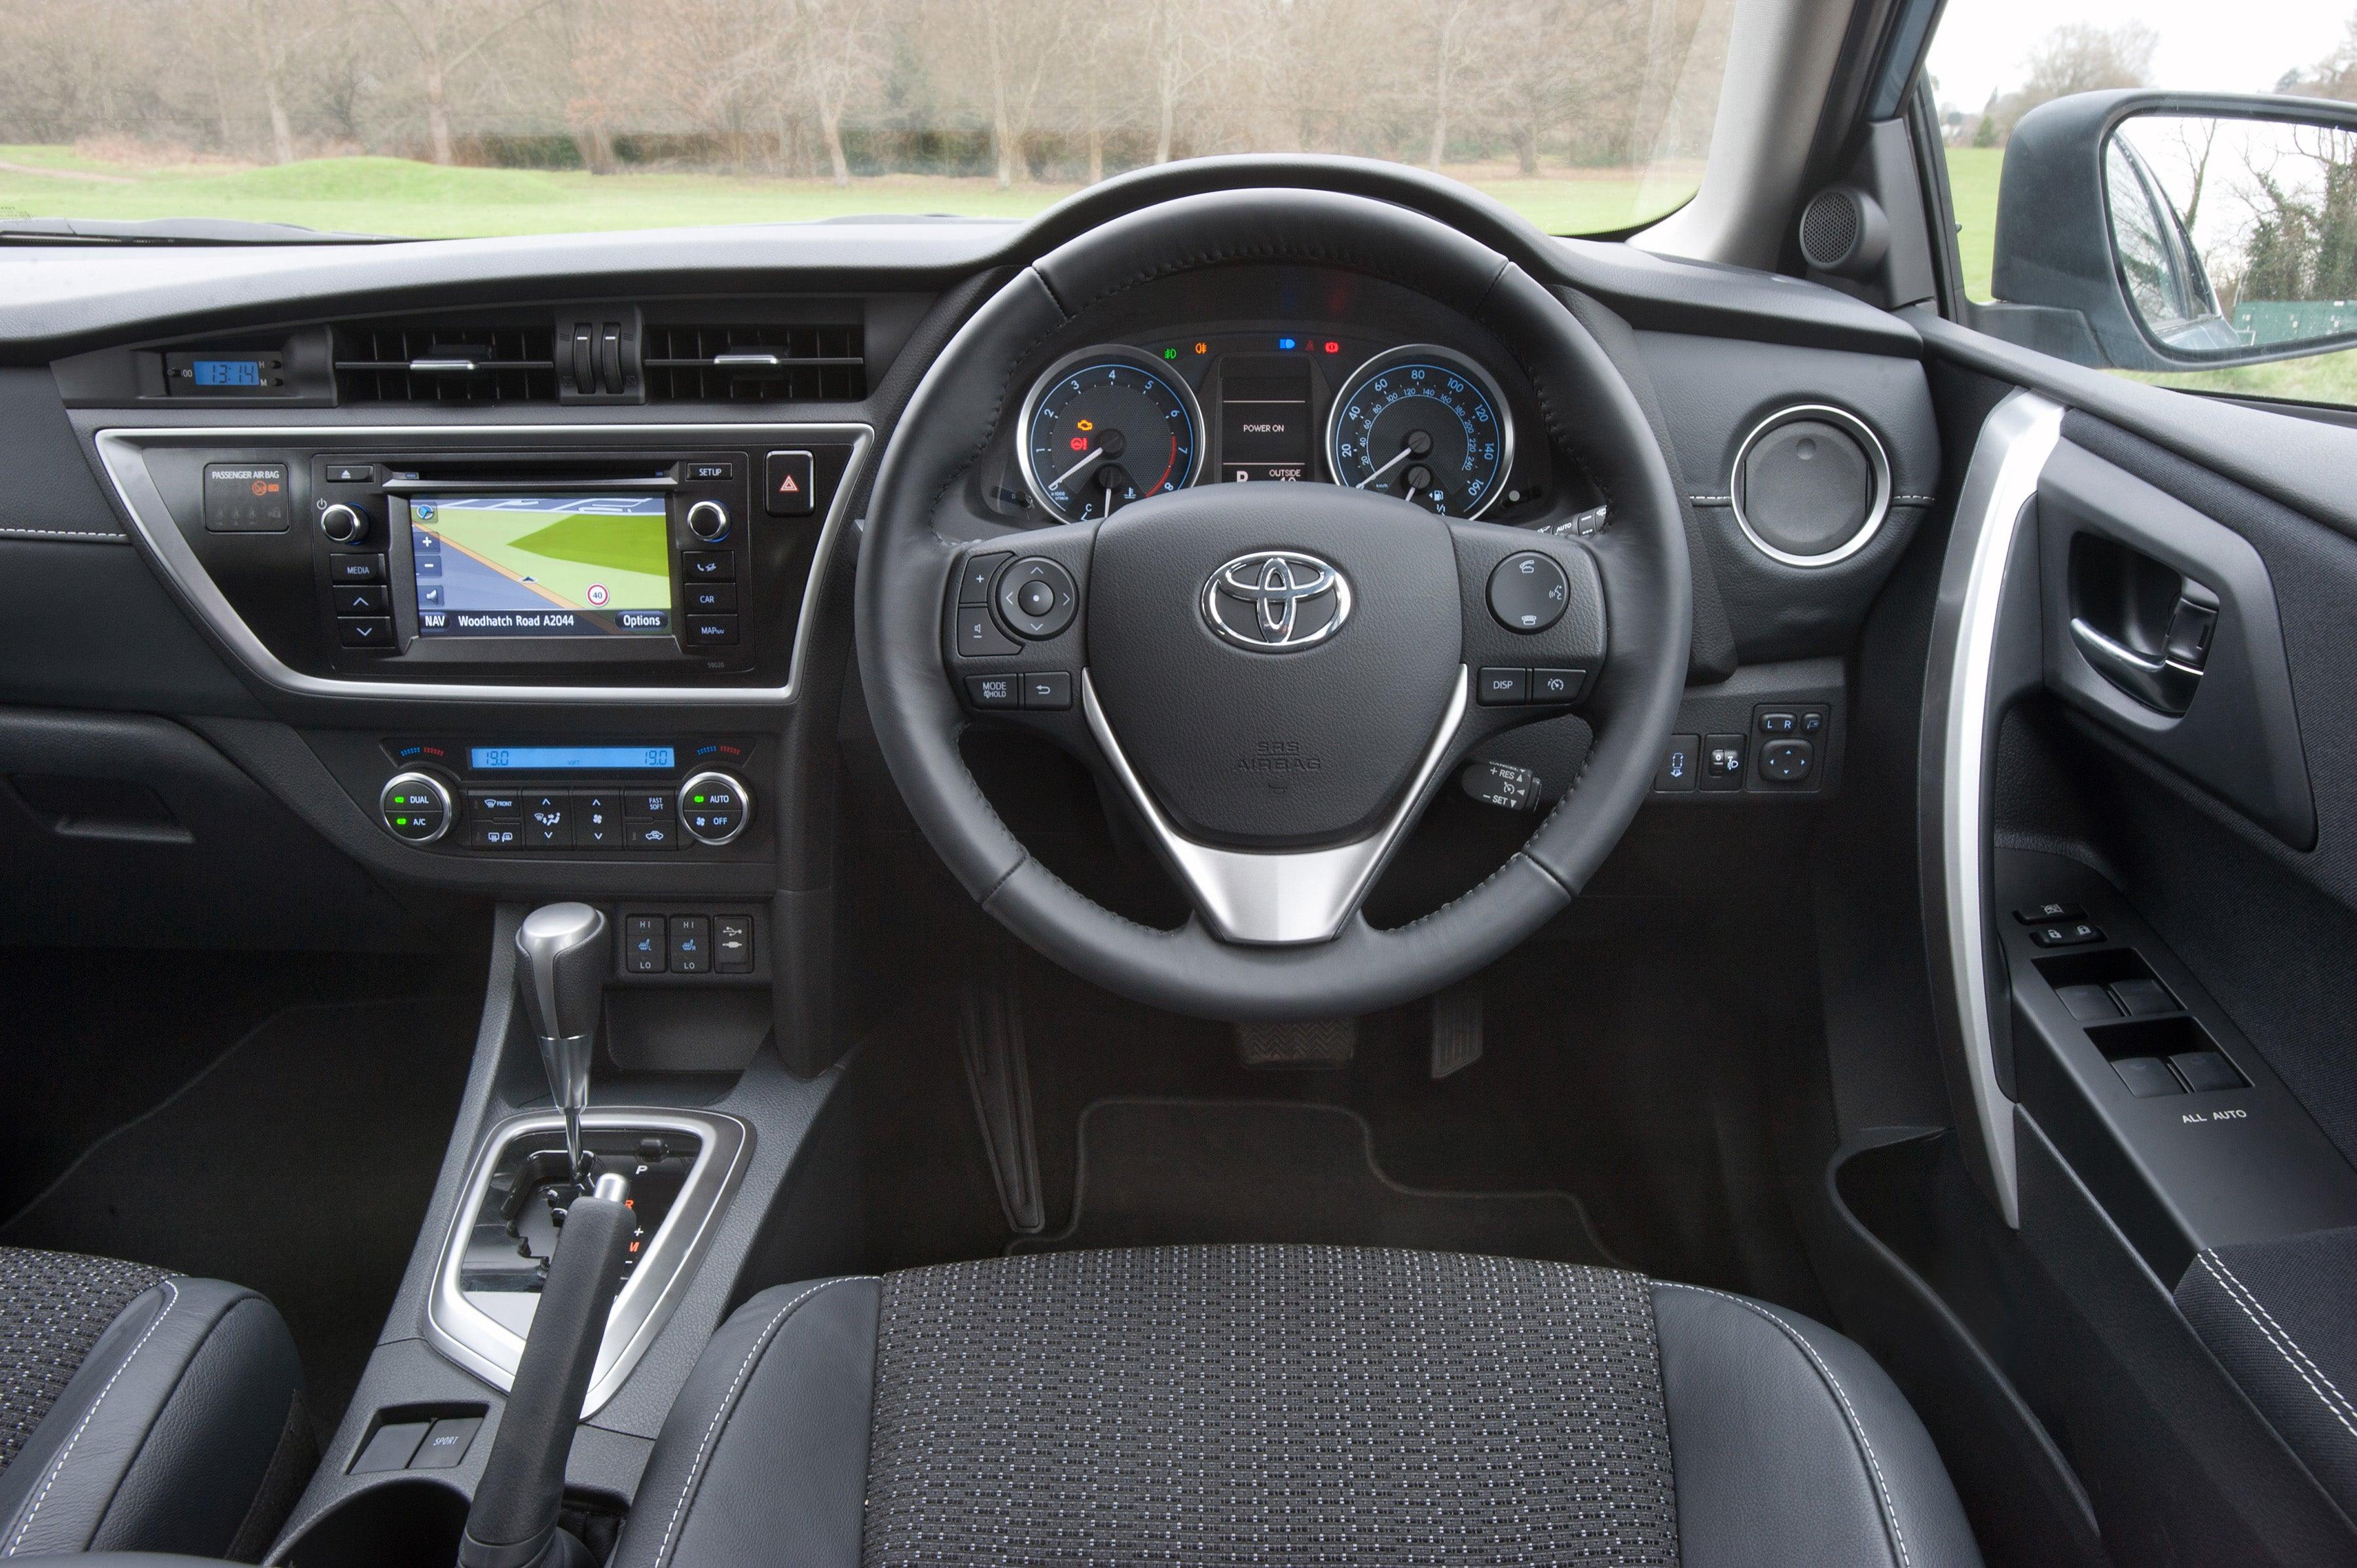 Toyota Auris Driver's Seat